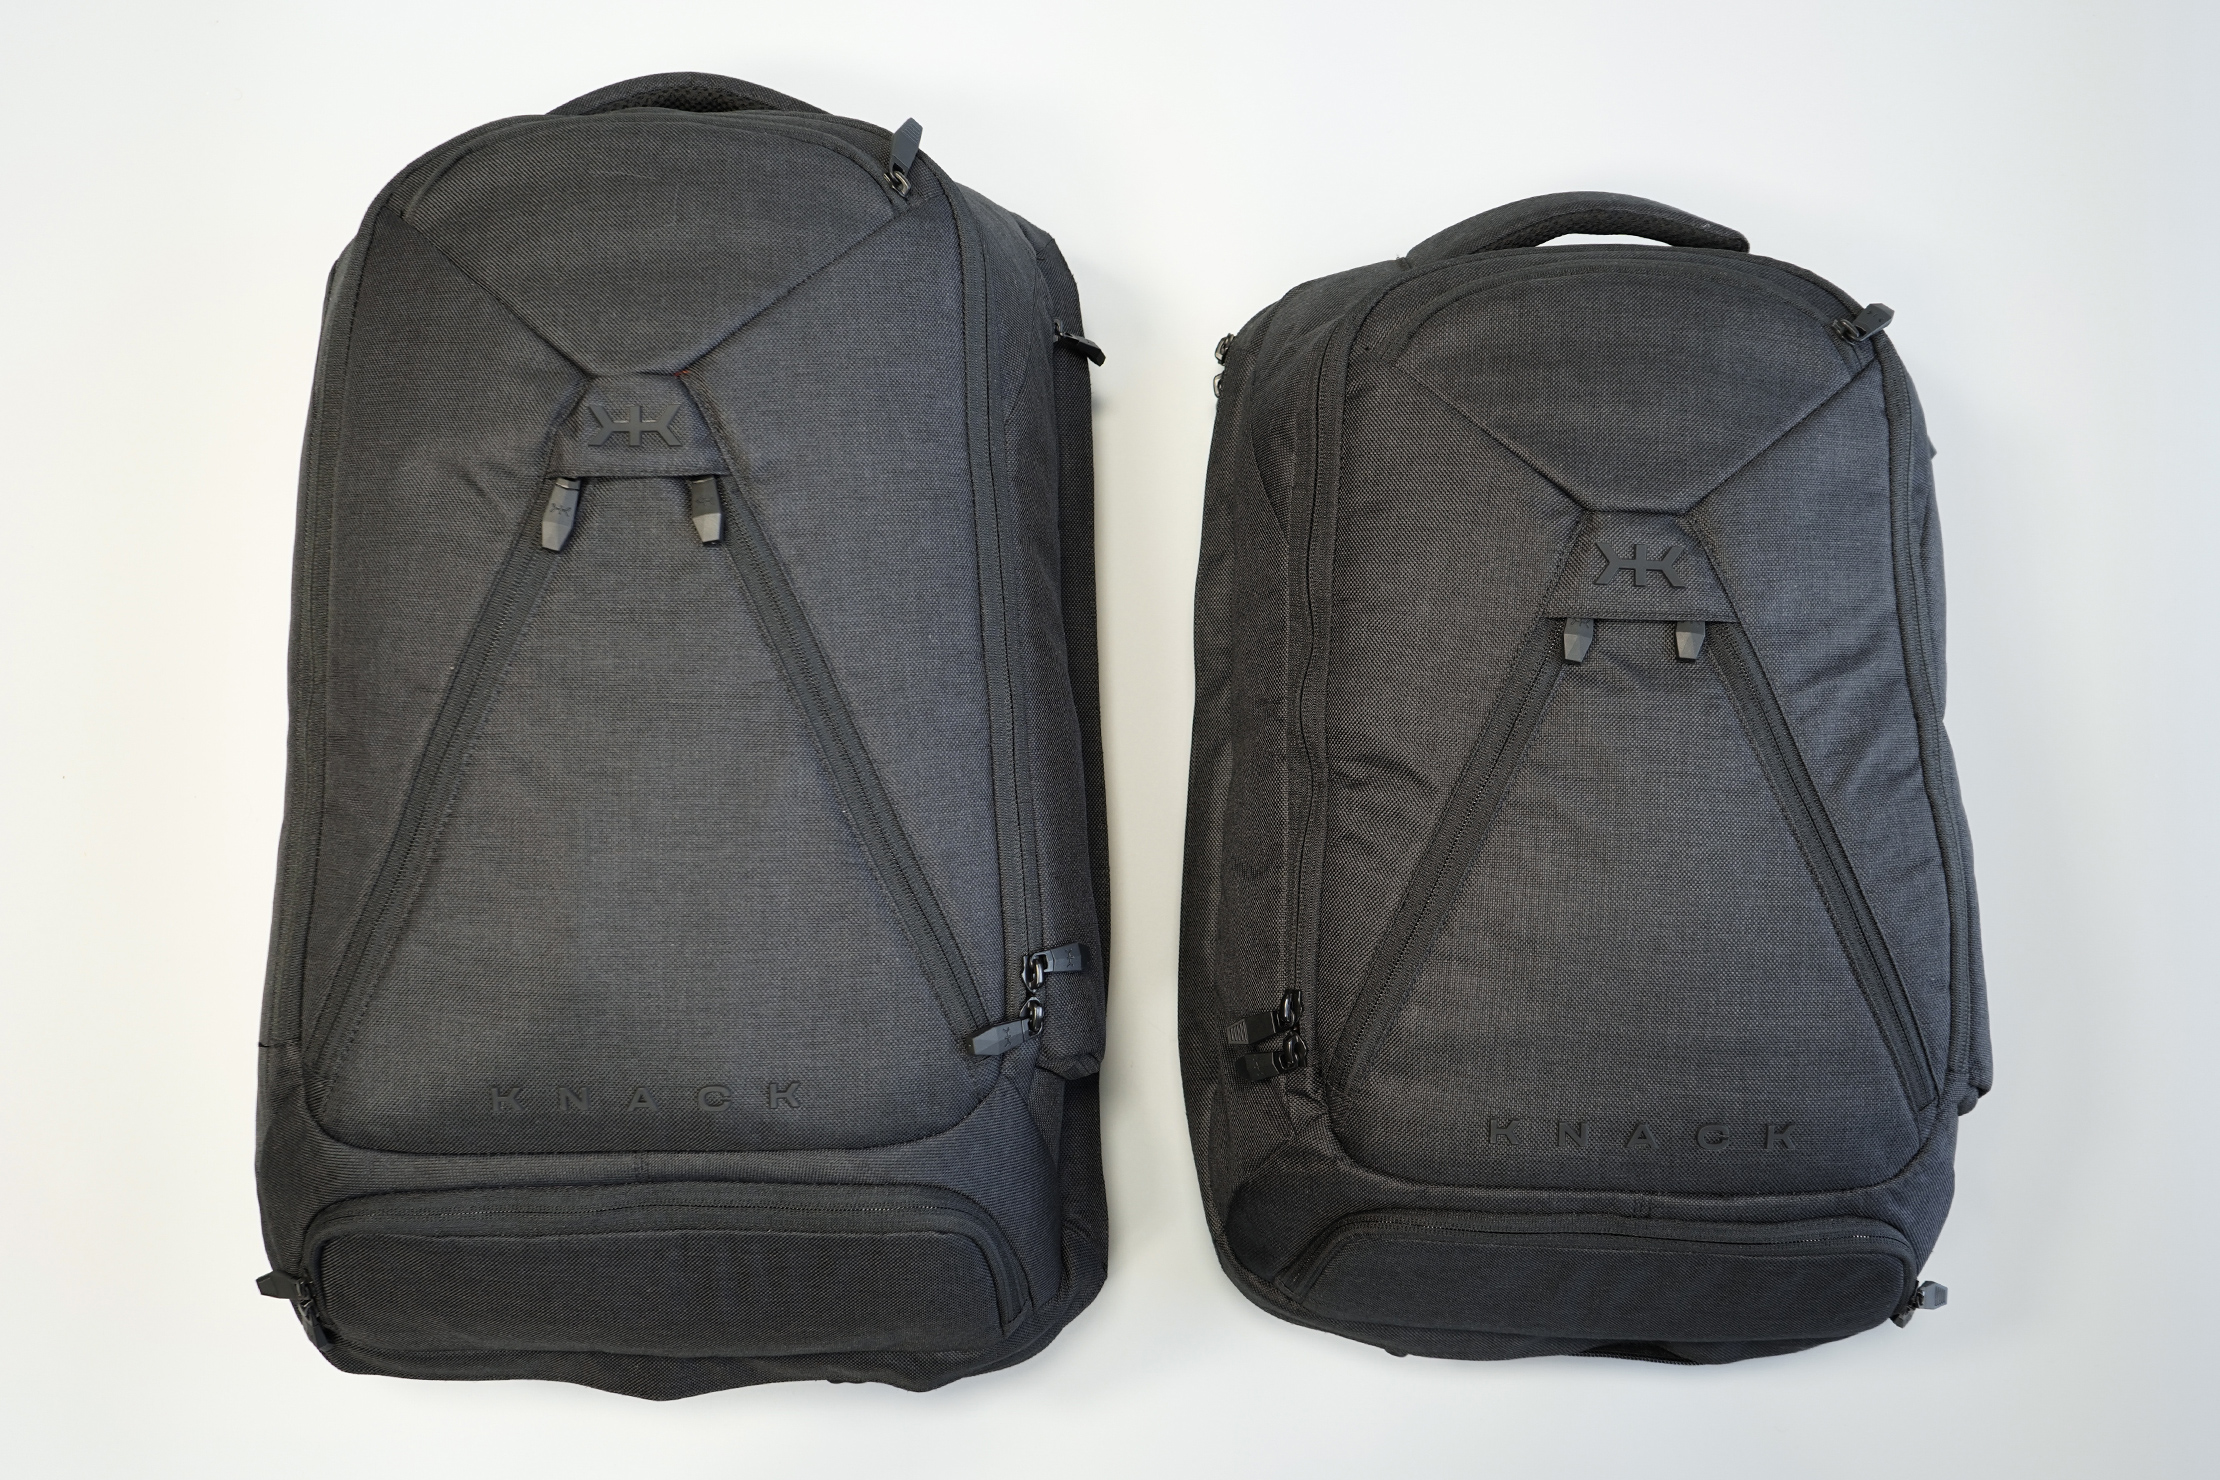 Knack Large Expandable Pack (Left) & Medium Expandable Pack (Right)